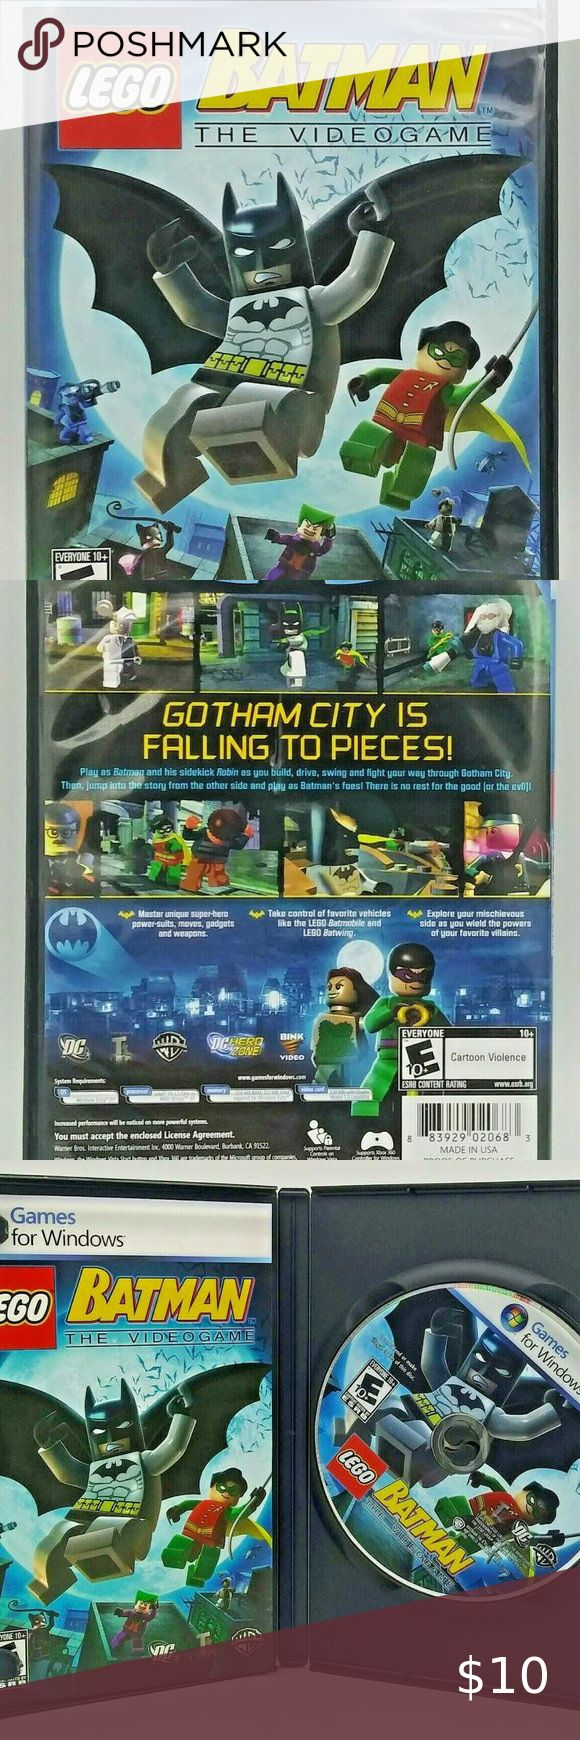 LEGO Batman The Video game for PC in 2020 | Lego batman ...